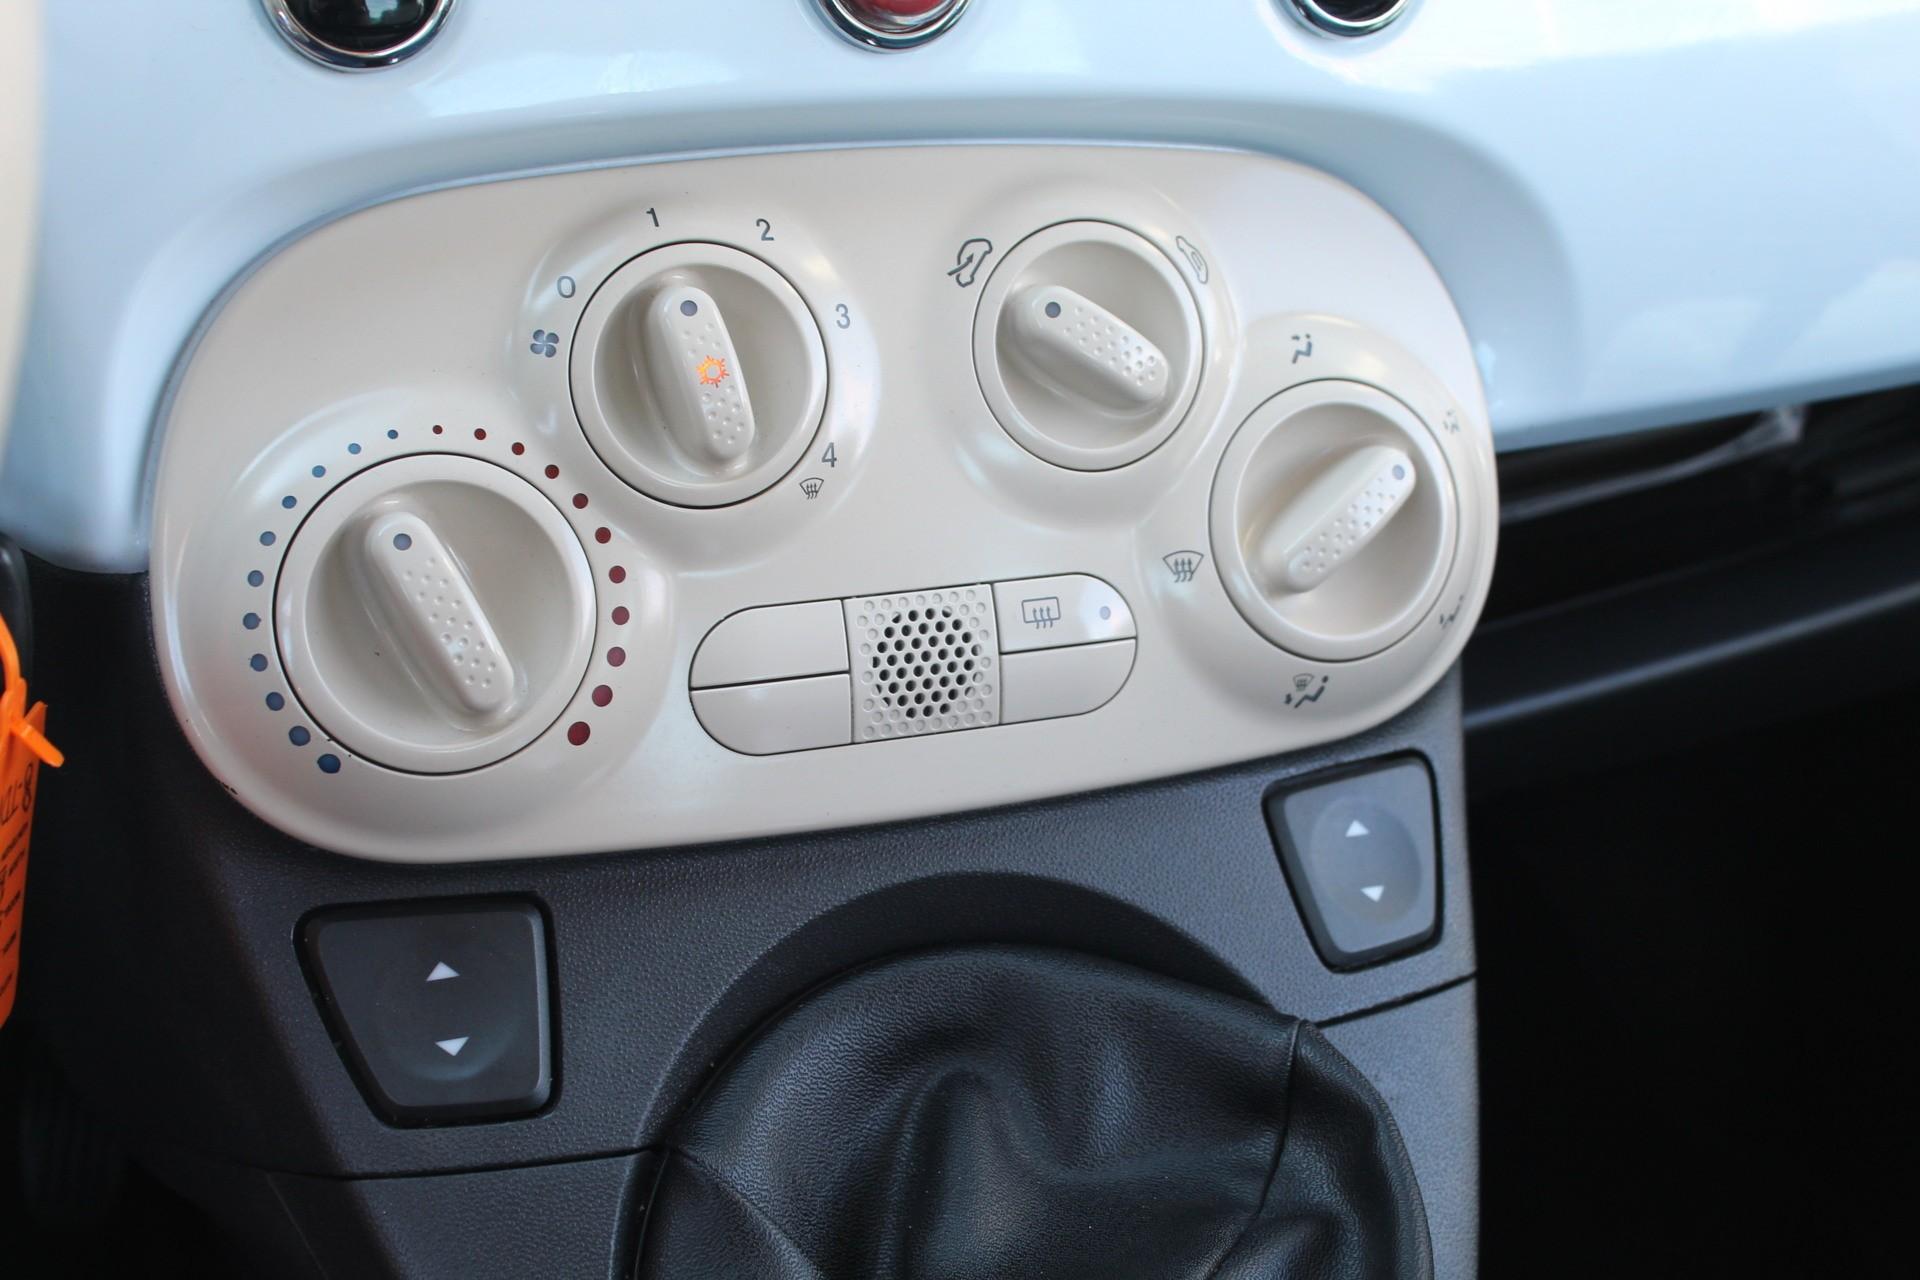 Caroutlet Groningen - Fiat 500 1.2 Lounge   AIRCO   VELGEN   UNIEKE KLEUR  